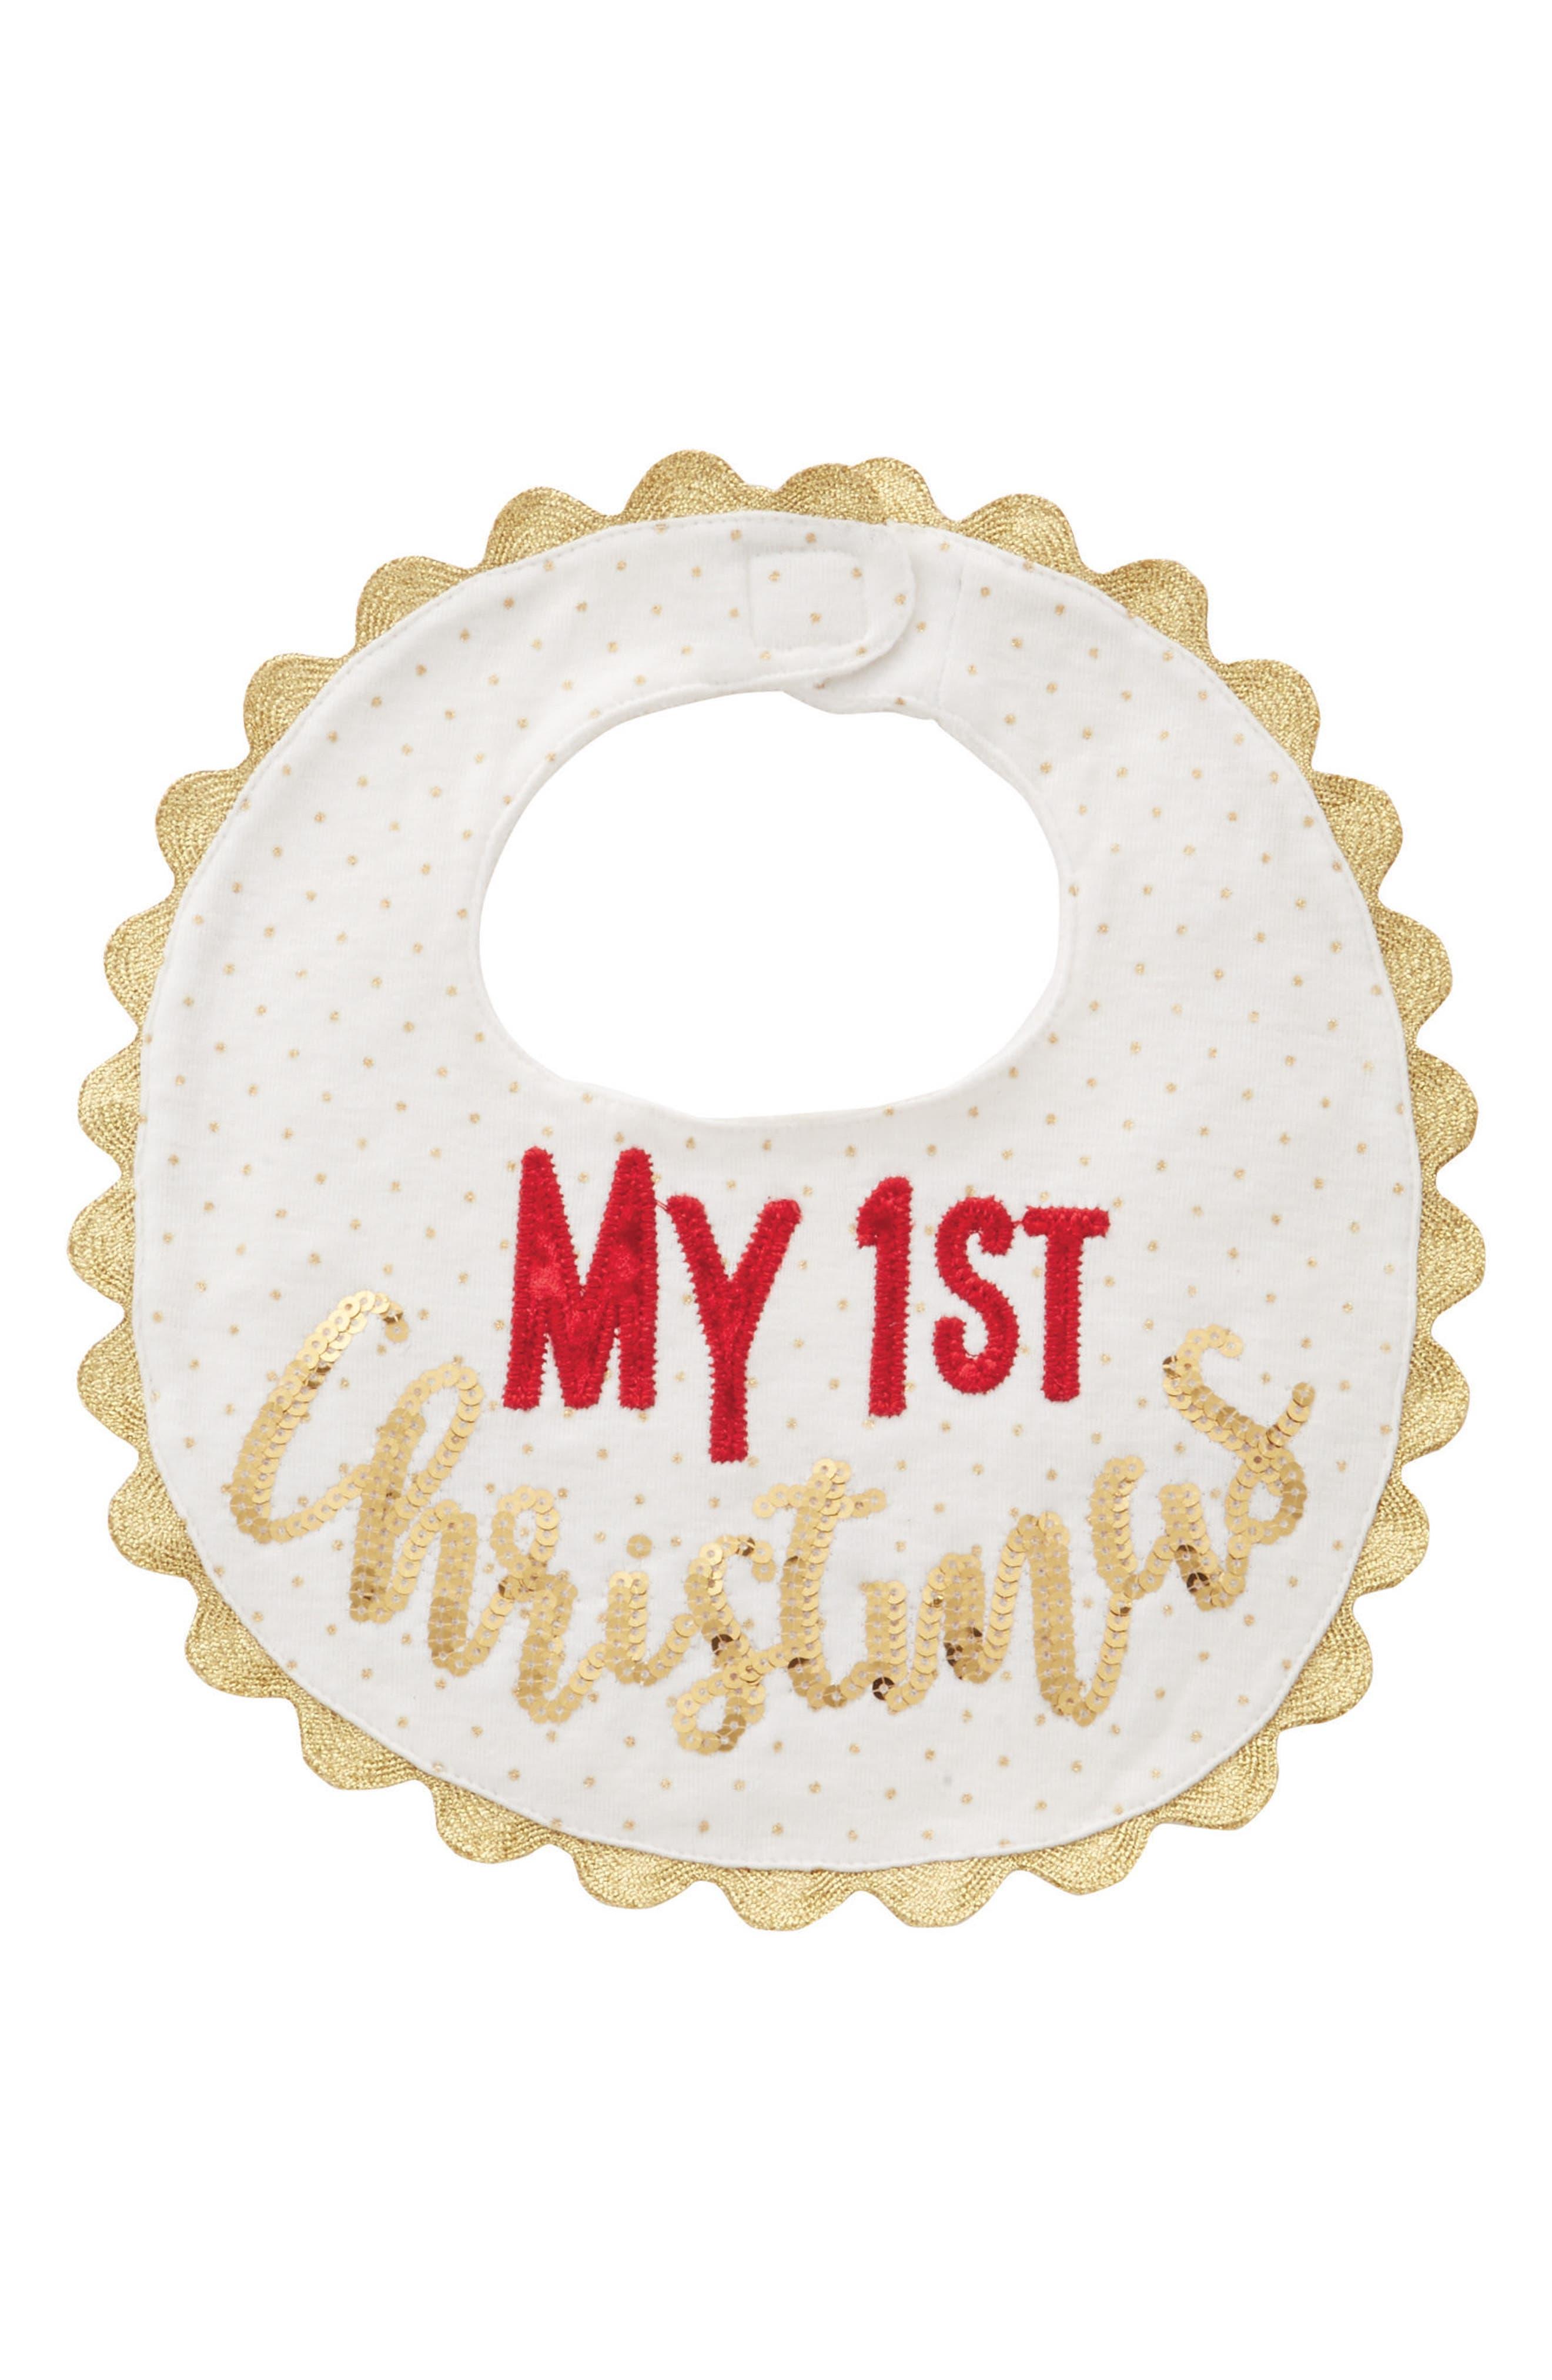 My First Christmas Bib,                         Main,                         color, 710